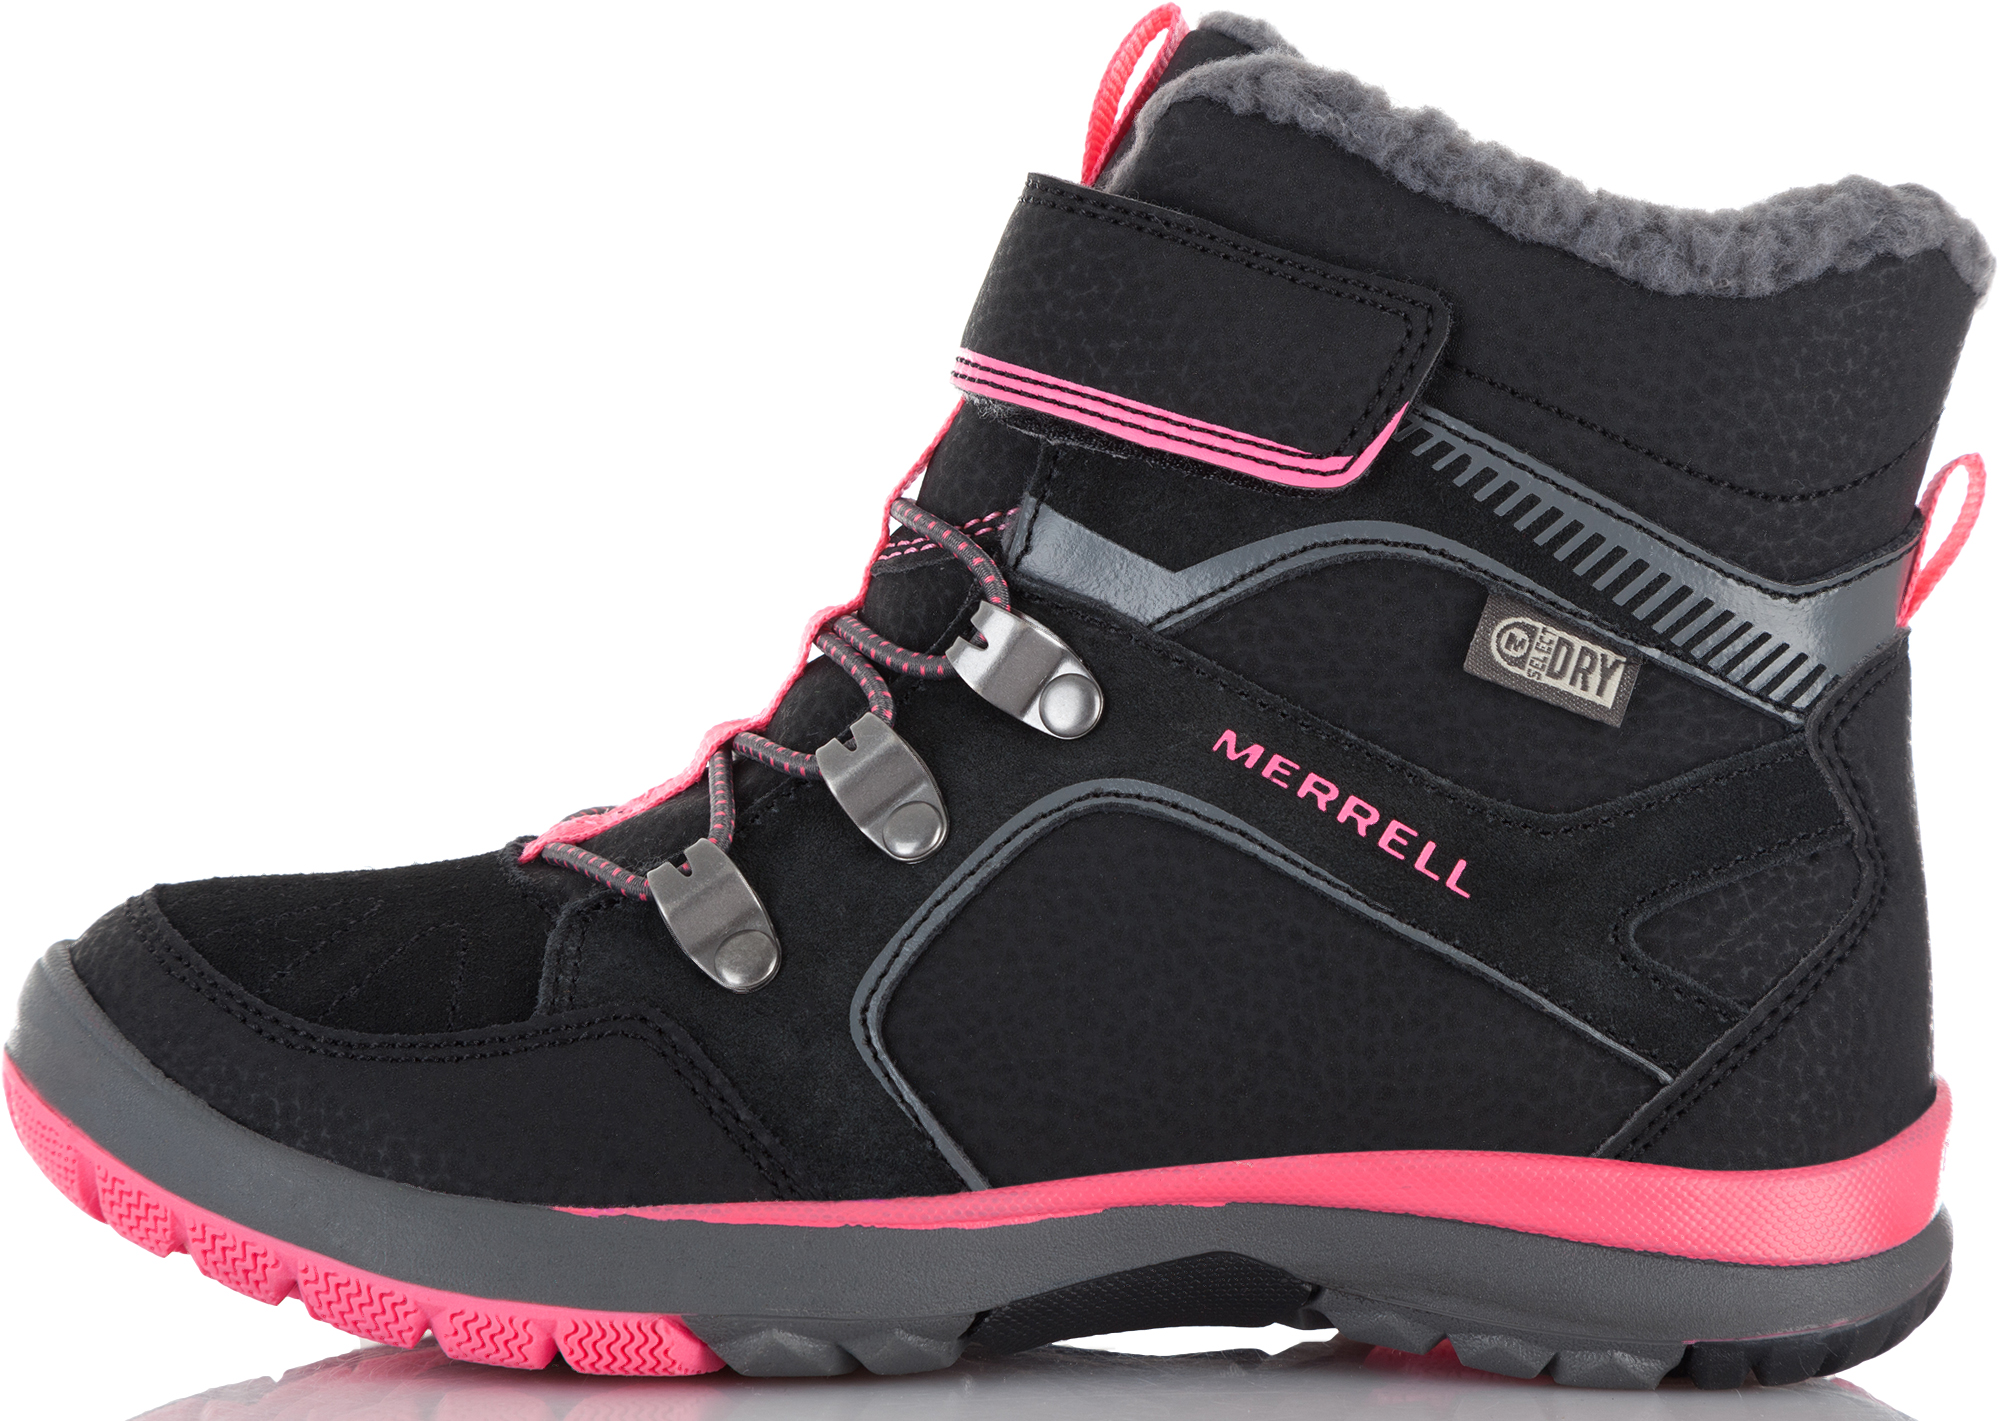 Merrell Ботинки утепленные для девочек M-Moab Fst Polar Mid A/C Wtrpf, размер 40,5